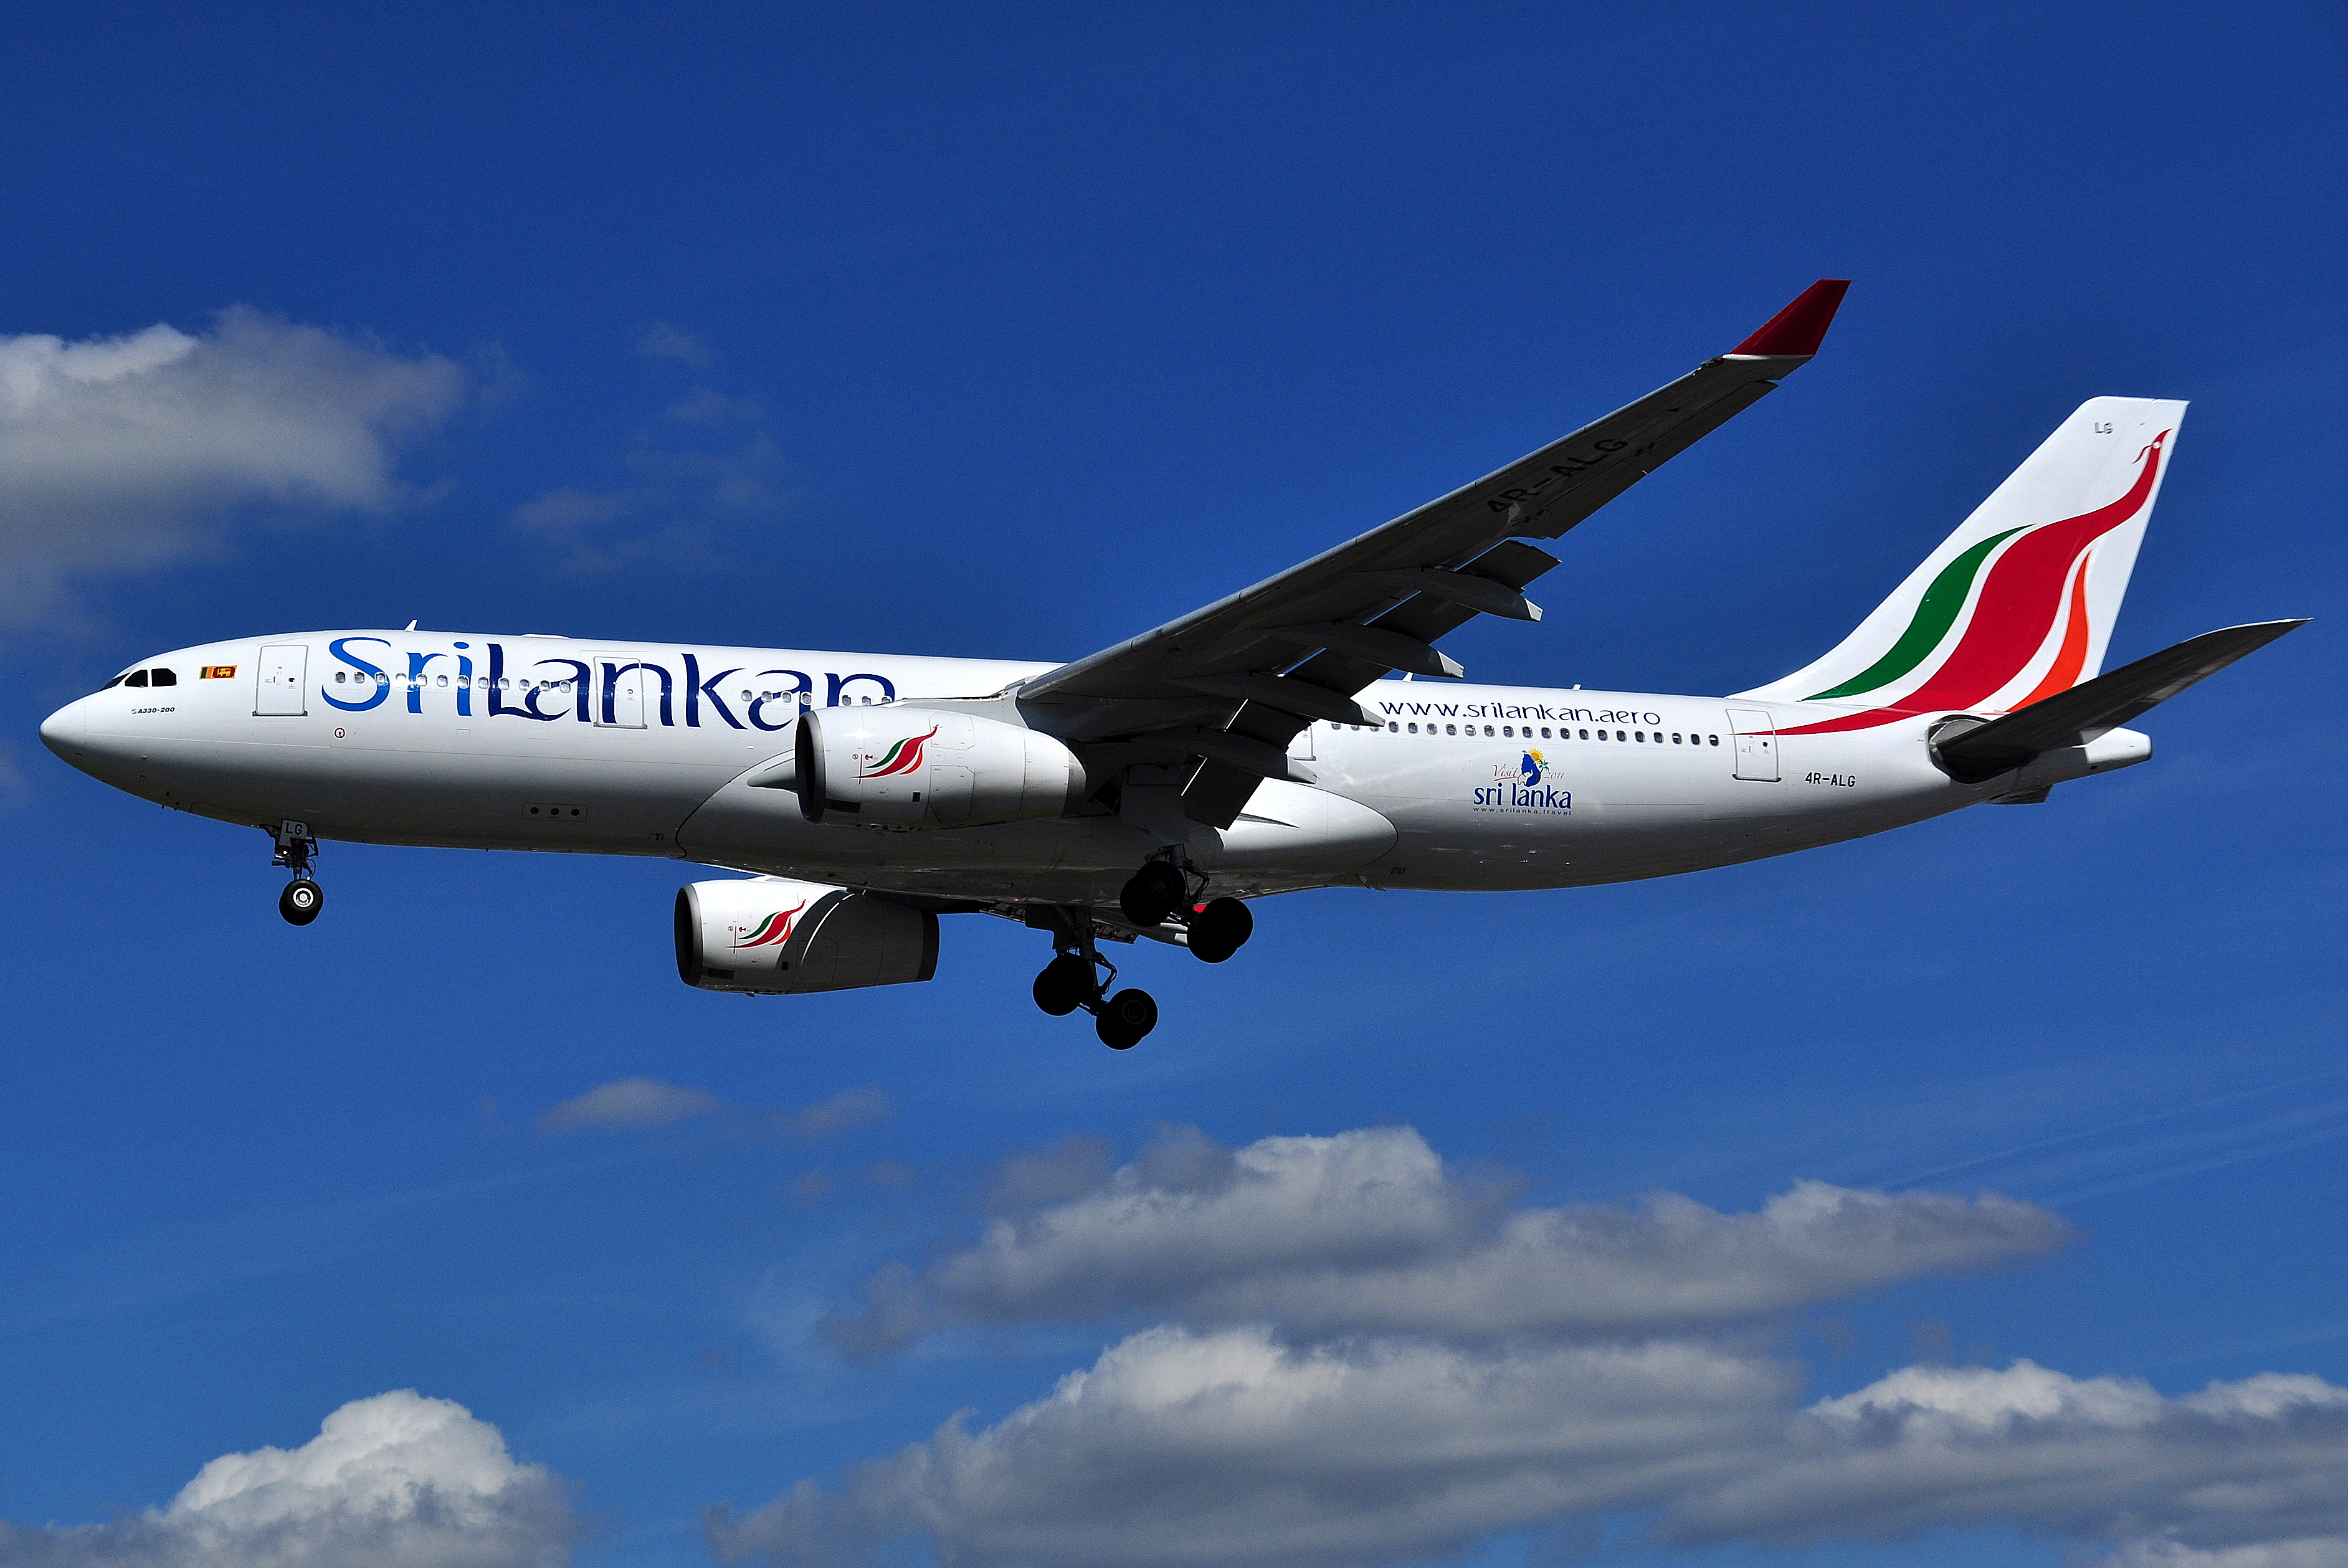 Description Airbus A330 200 SriLankan Airlines (4R ALG)